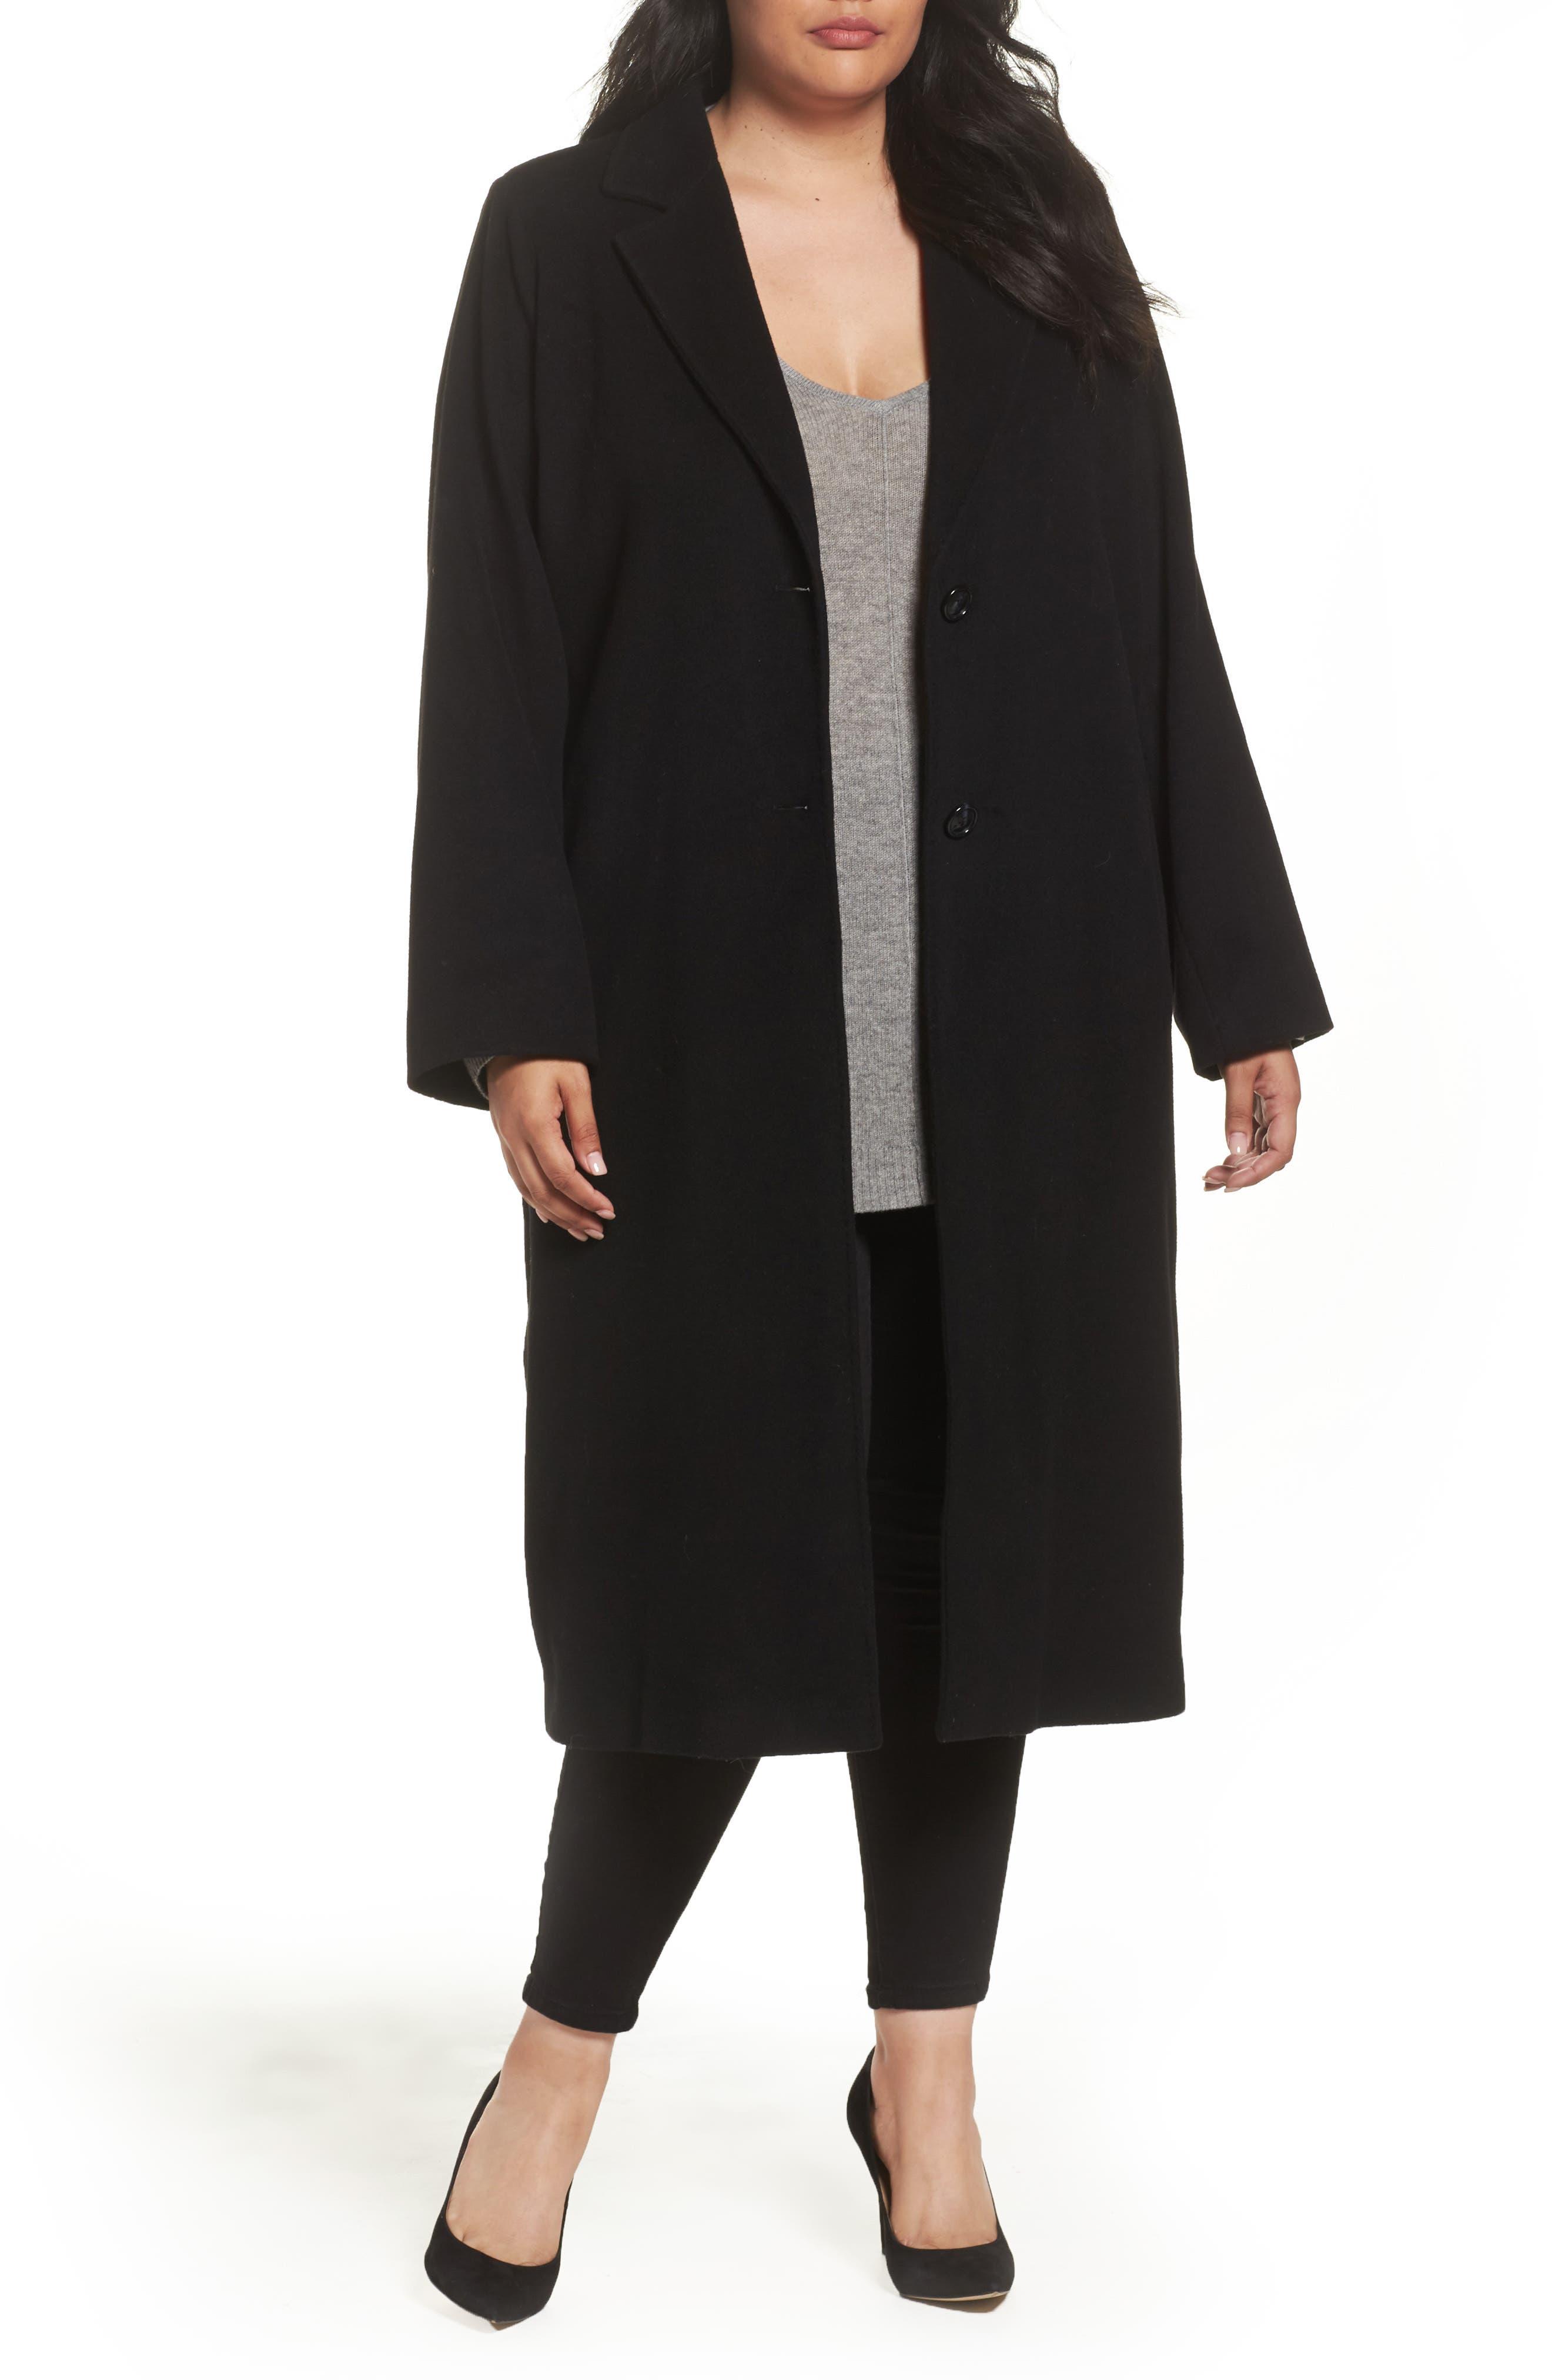 Main Image - Persona by Marina Rinaldi Tamigi Coat (Plus Size)